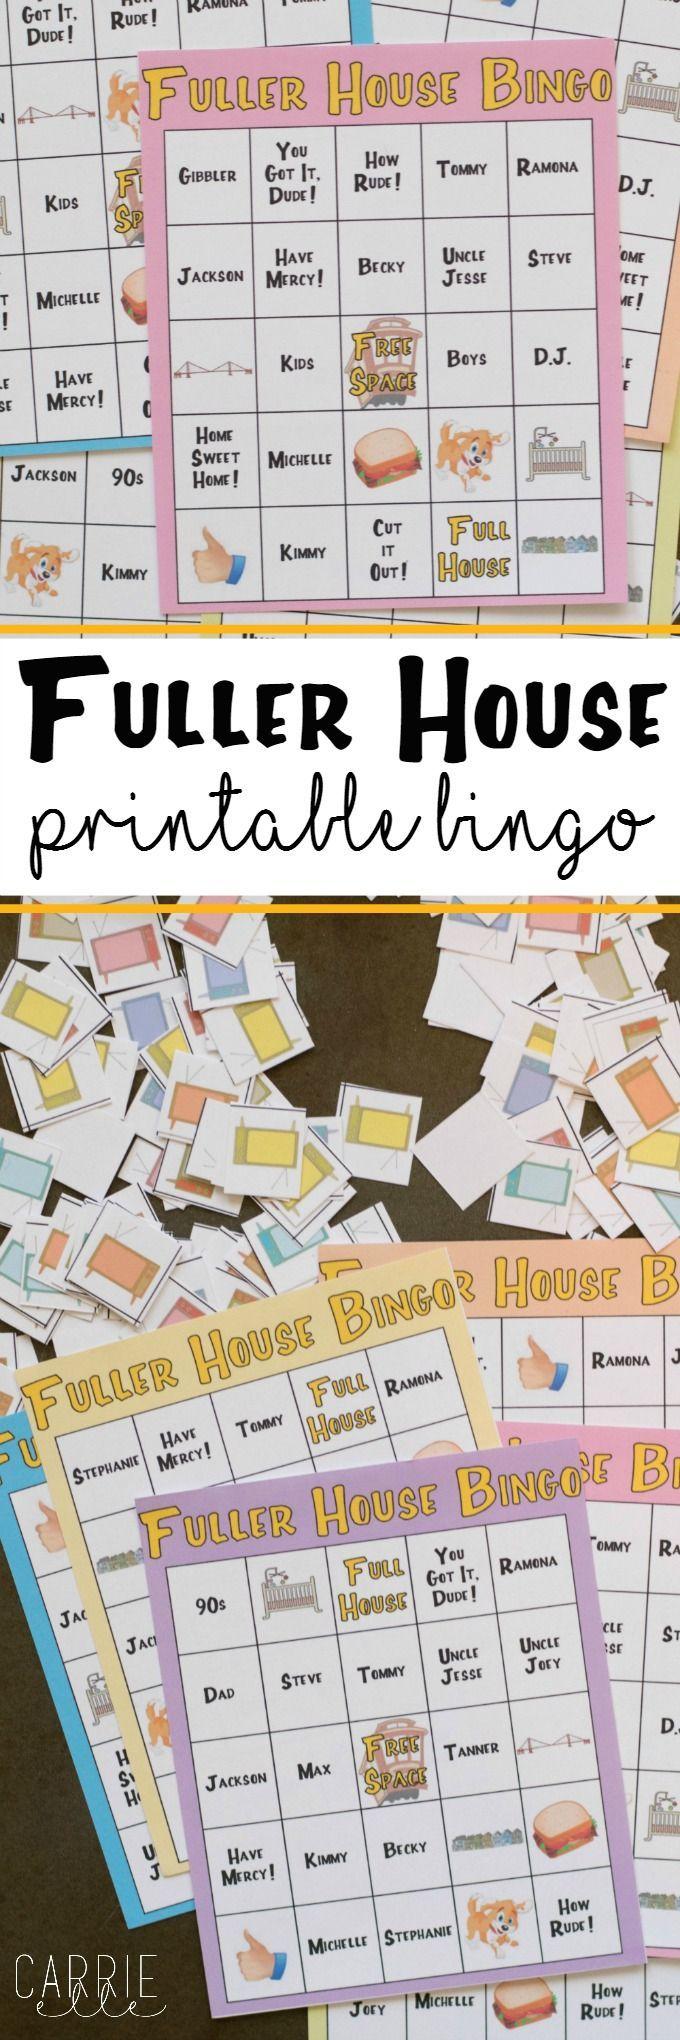 Printable Fuller House Bingo Game